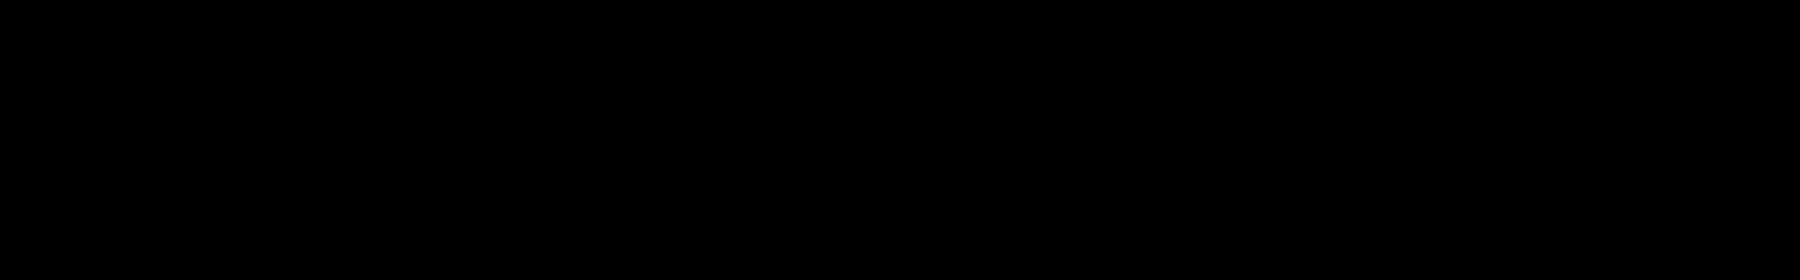 Dubstep Arcade audio waveform